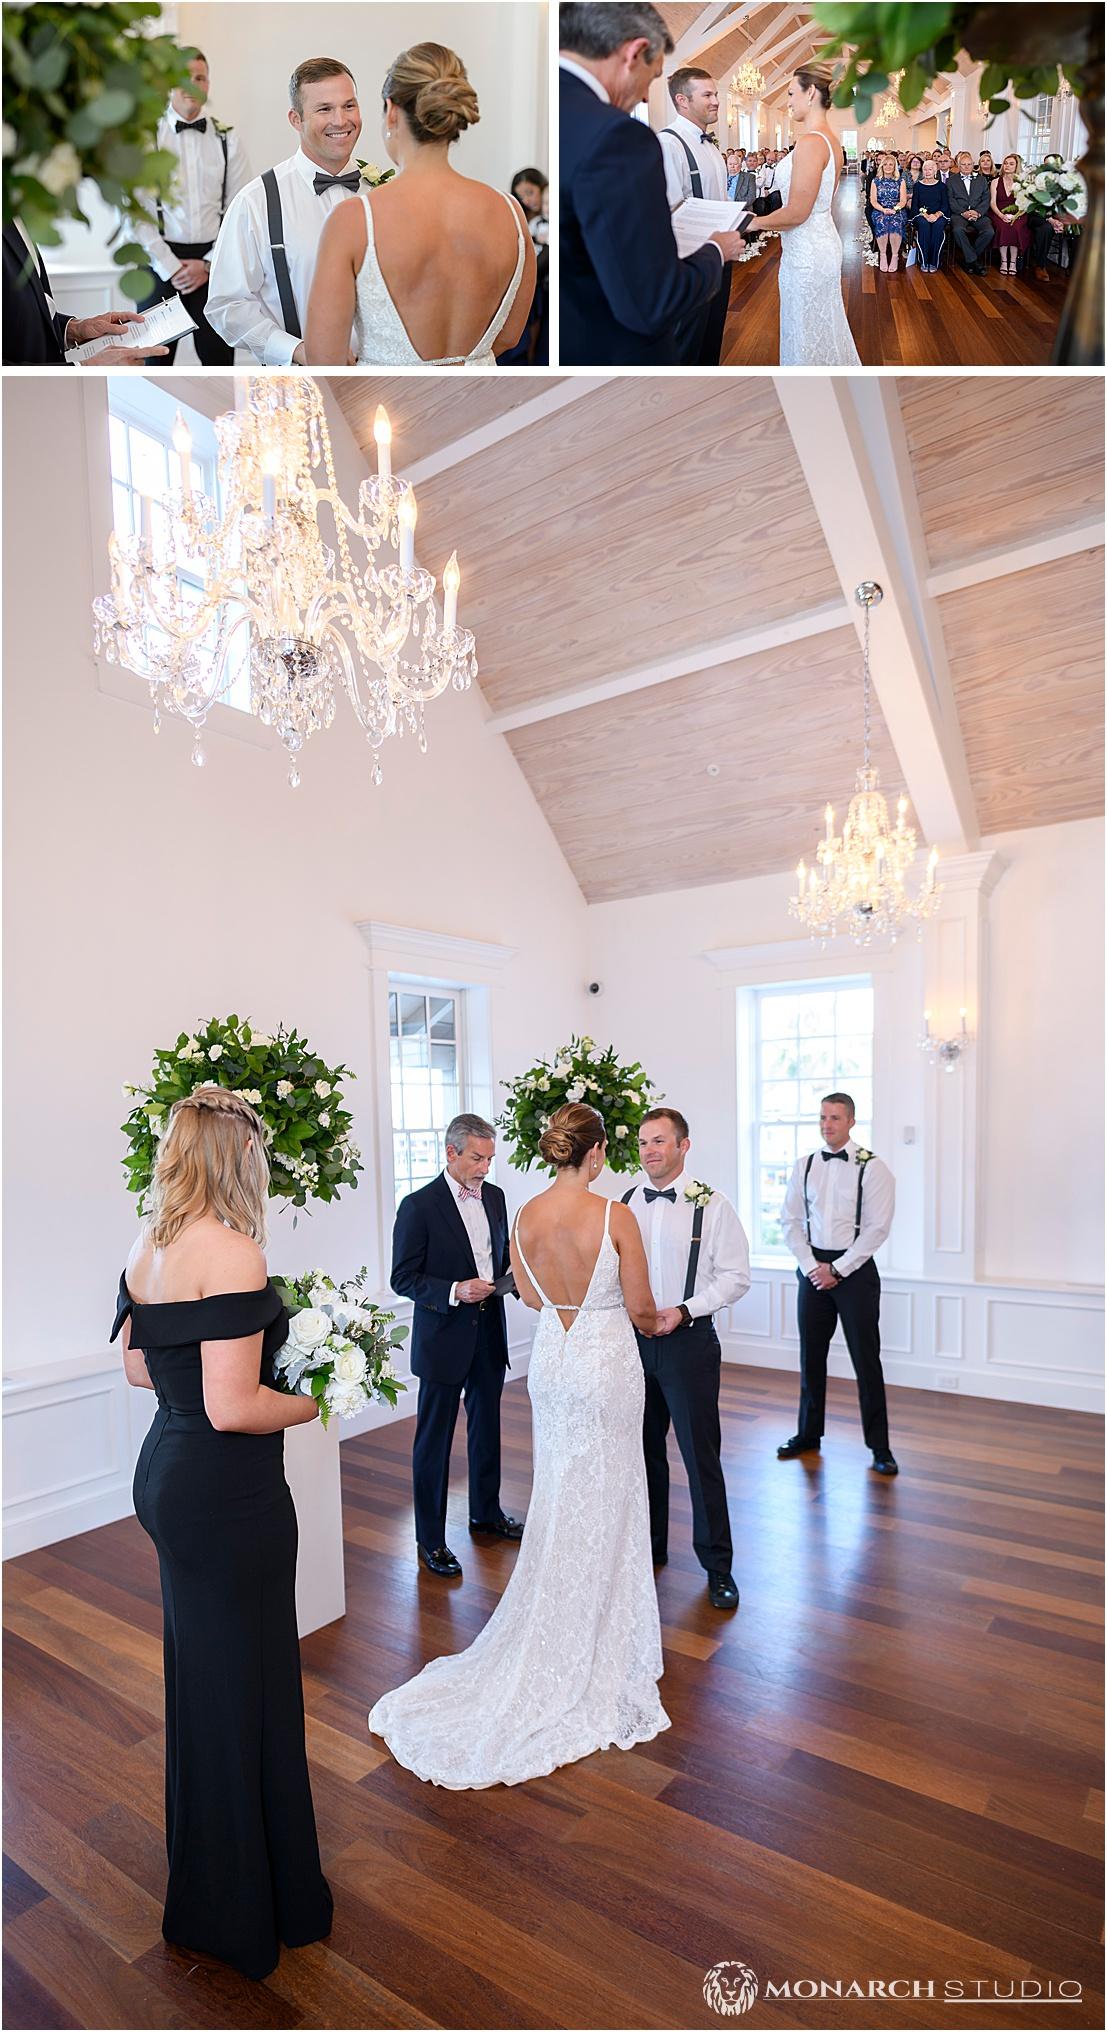 070-whiteroom-wedding-photographer-2019-05-22_0052.jpg